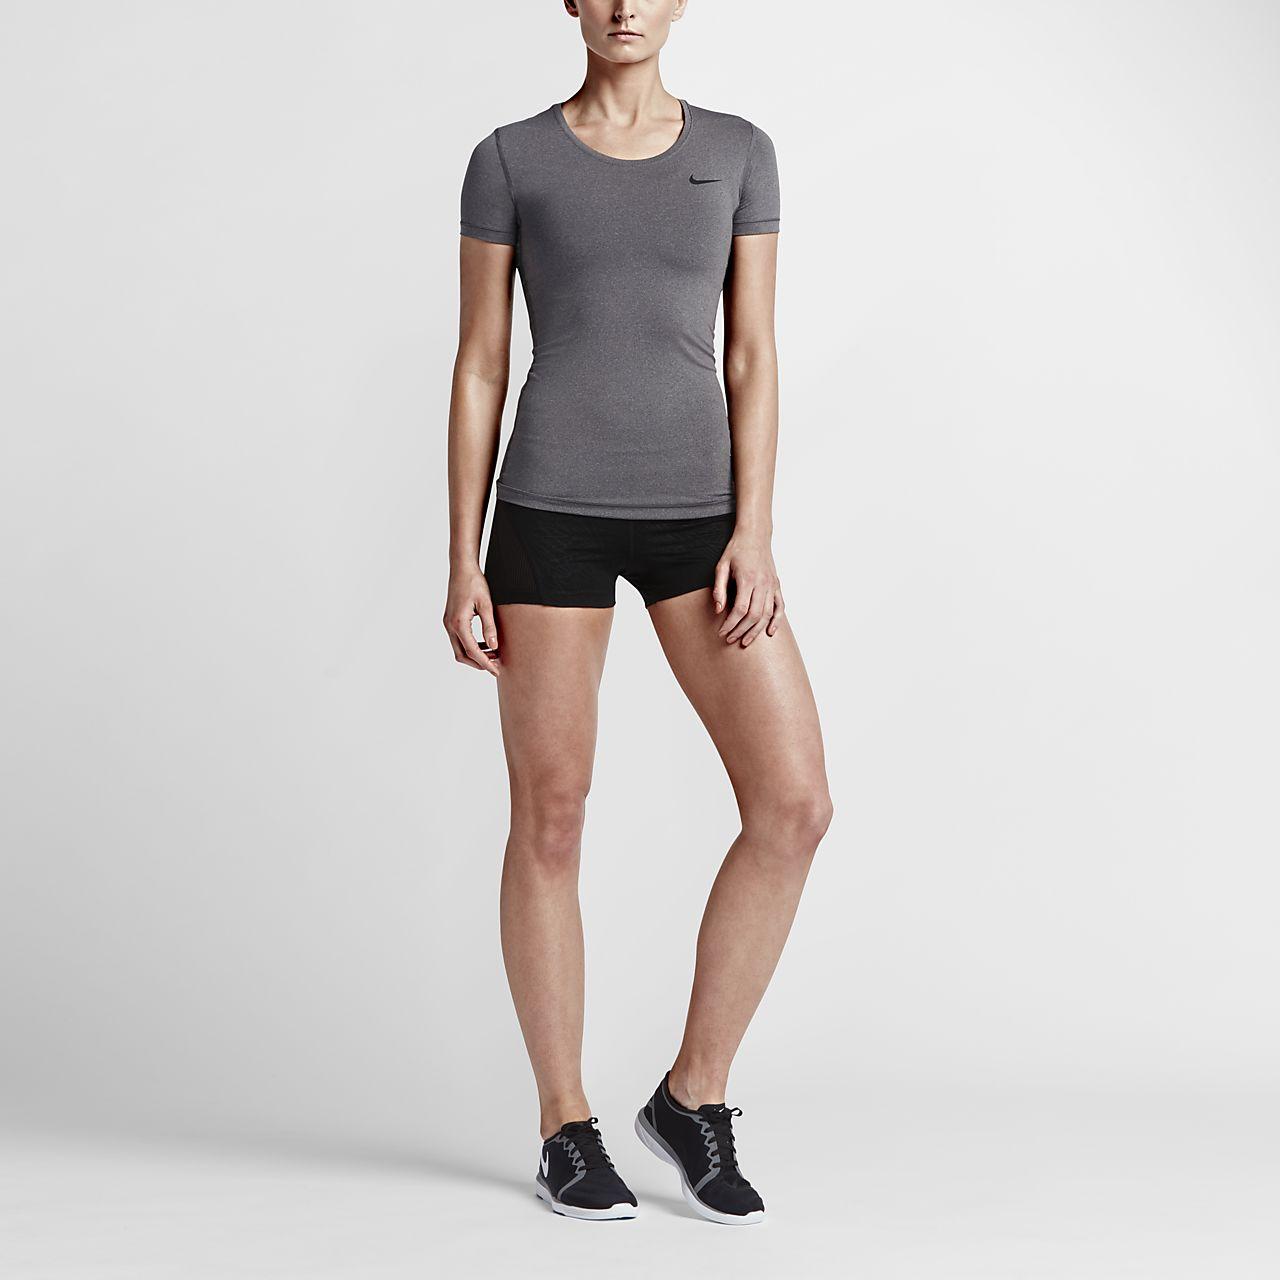 ... Nike Pro Women's Short Sleeve Training Top